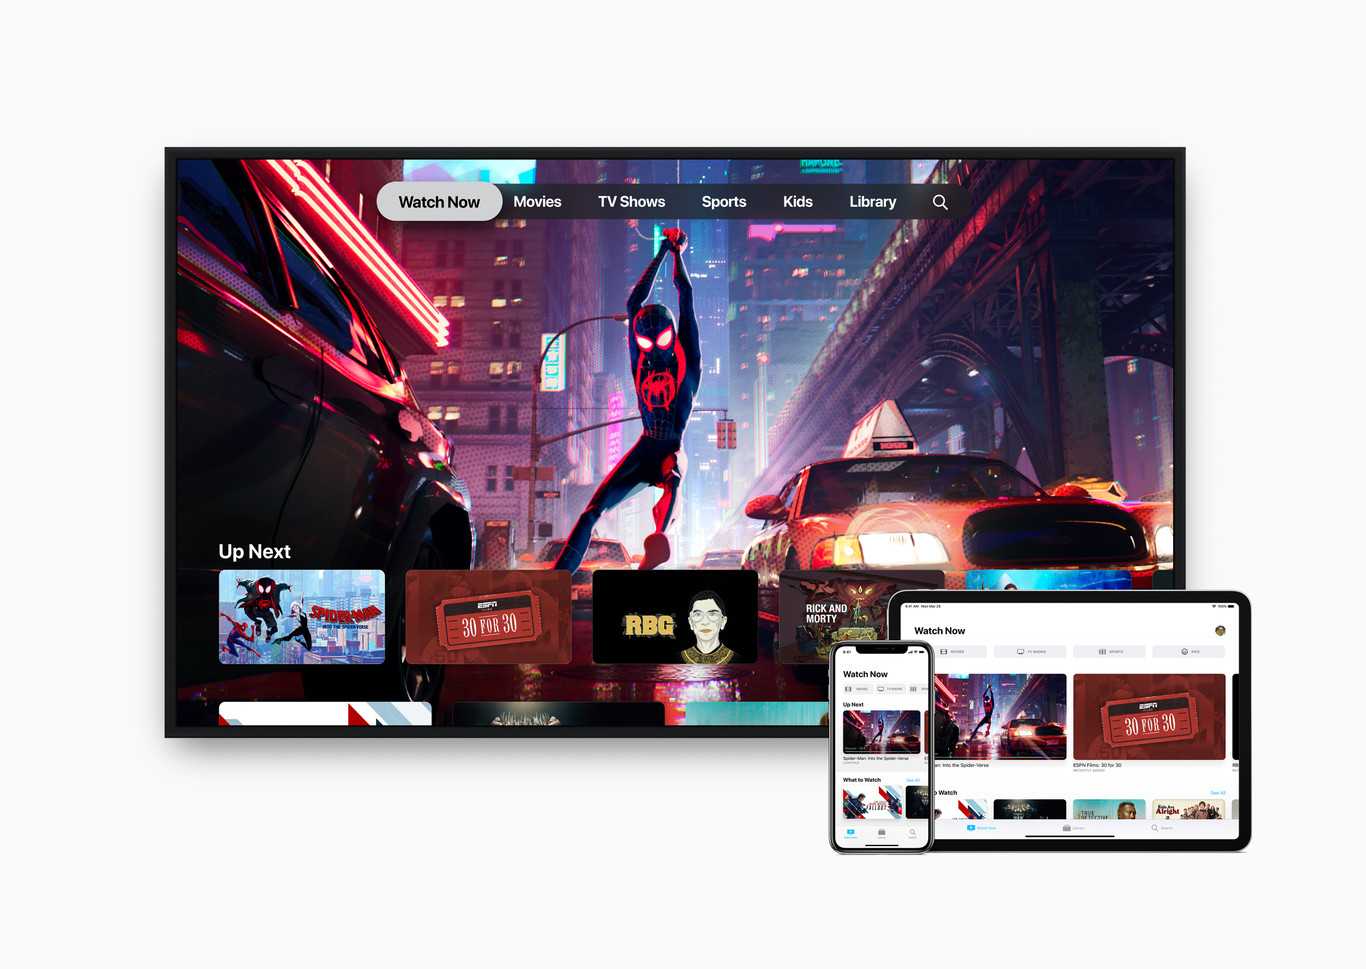 Scarica mediaset play su smart tv lg